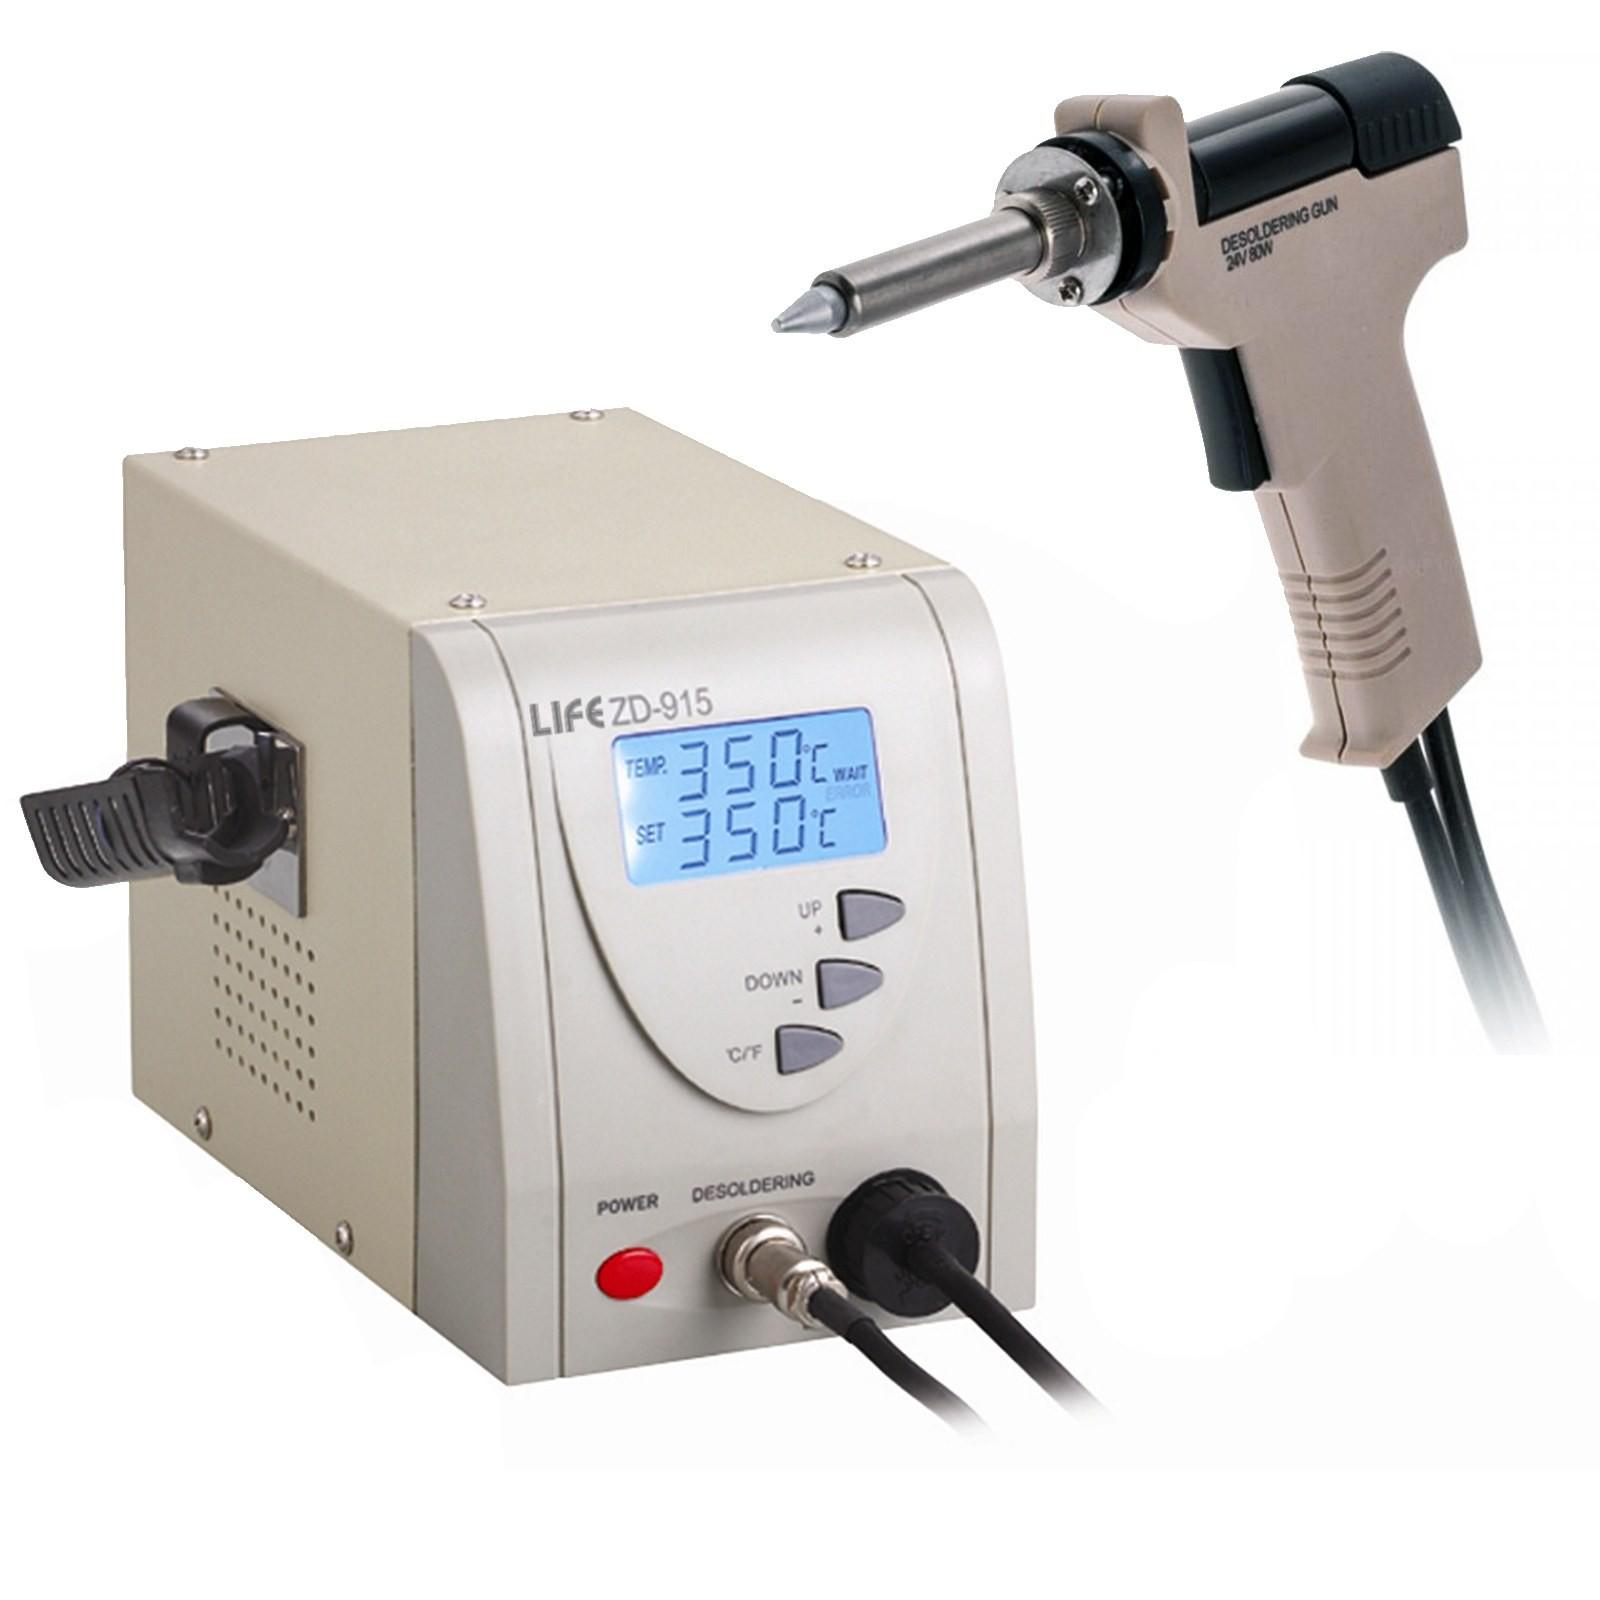 Stazione Dissaldante Digitale LIFE ZD-915 Saldatore Stagno Professionale 80 WATT